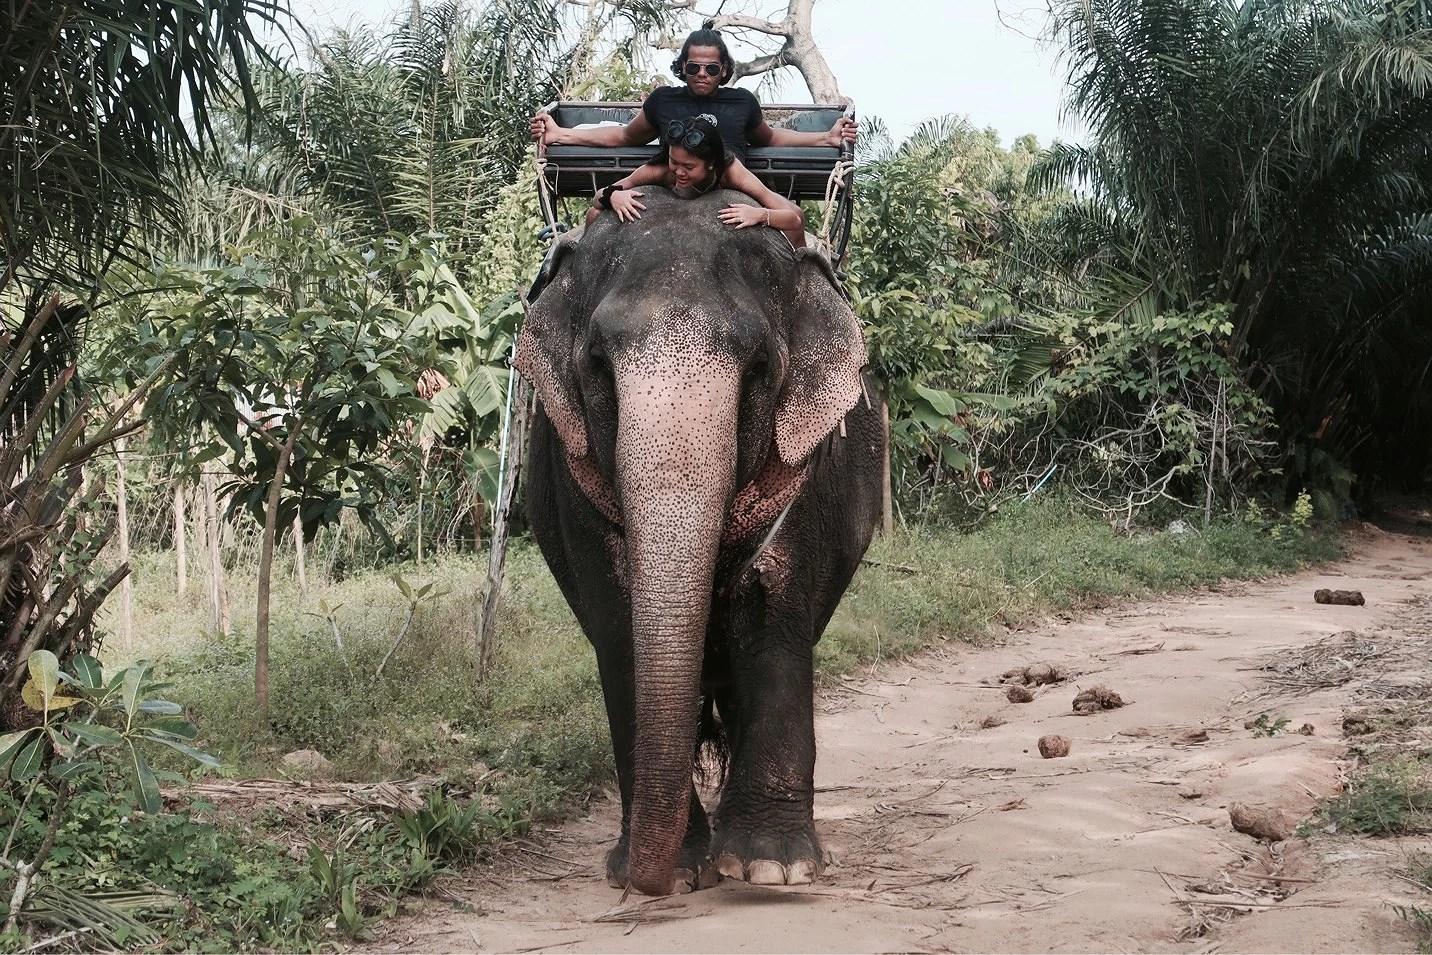 Thailand 2017 - Elephant trekking & Na Muang Waterfall